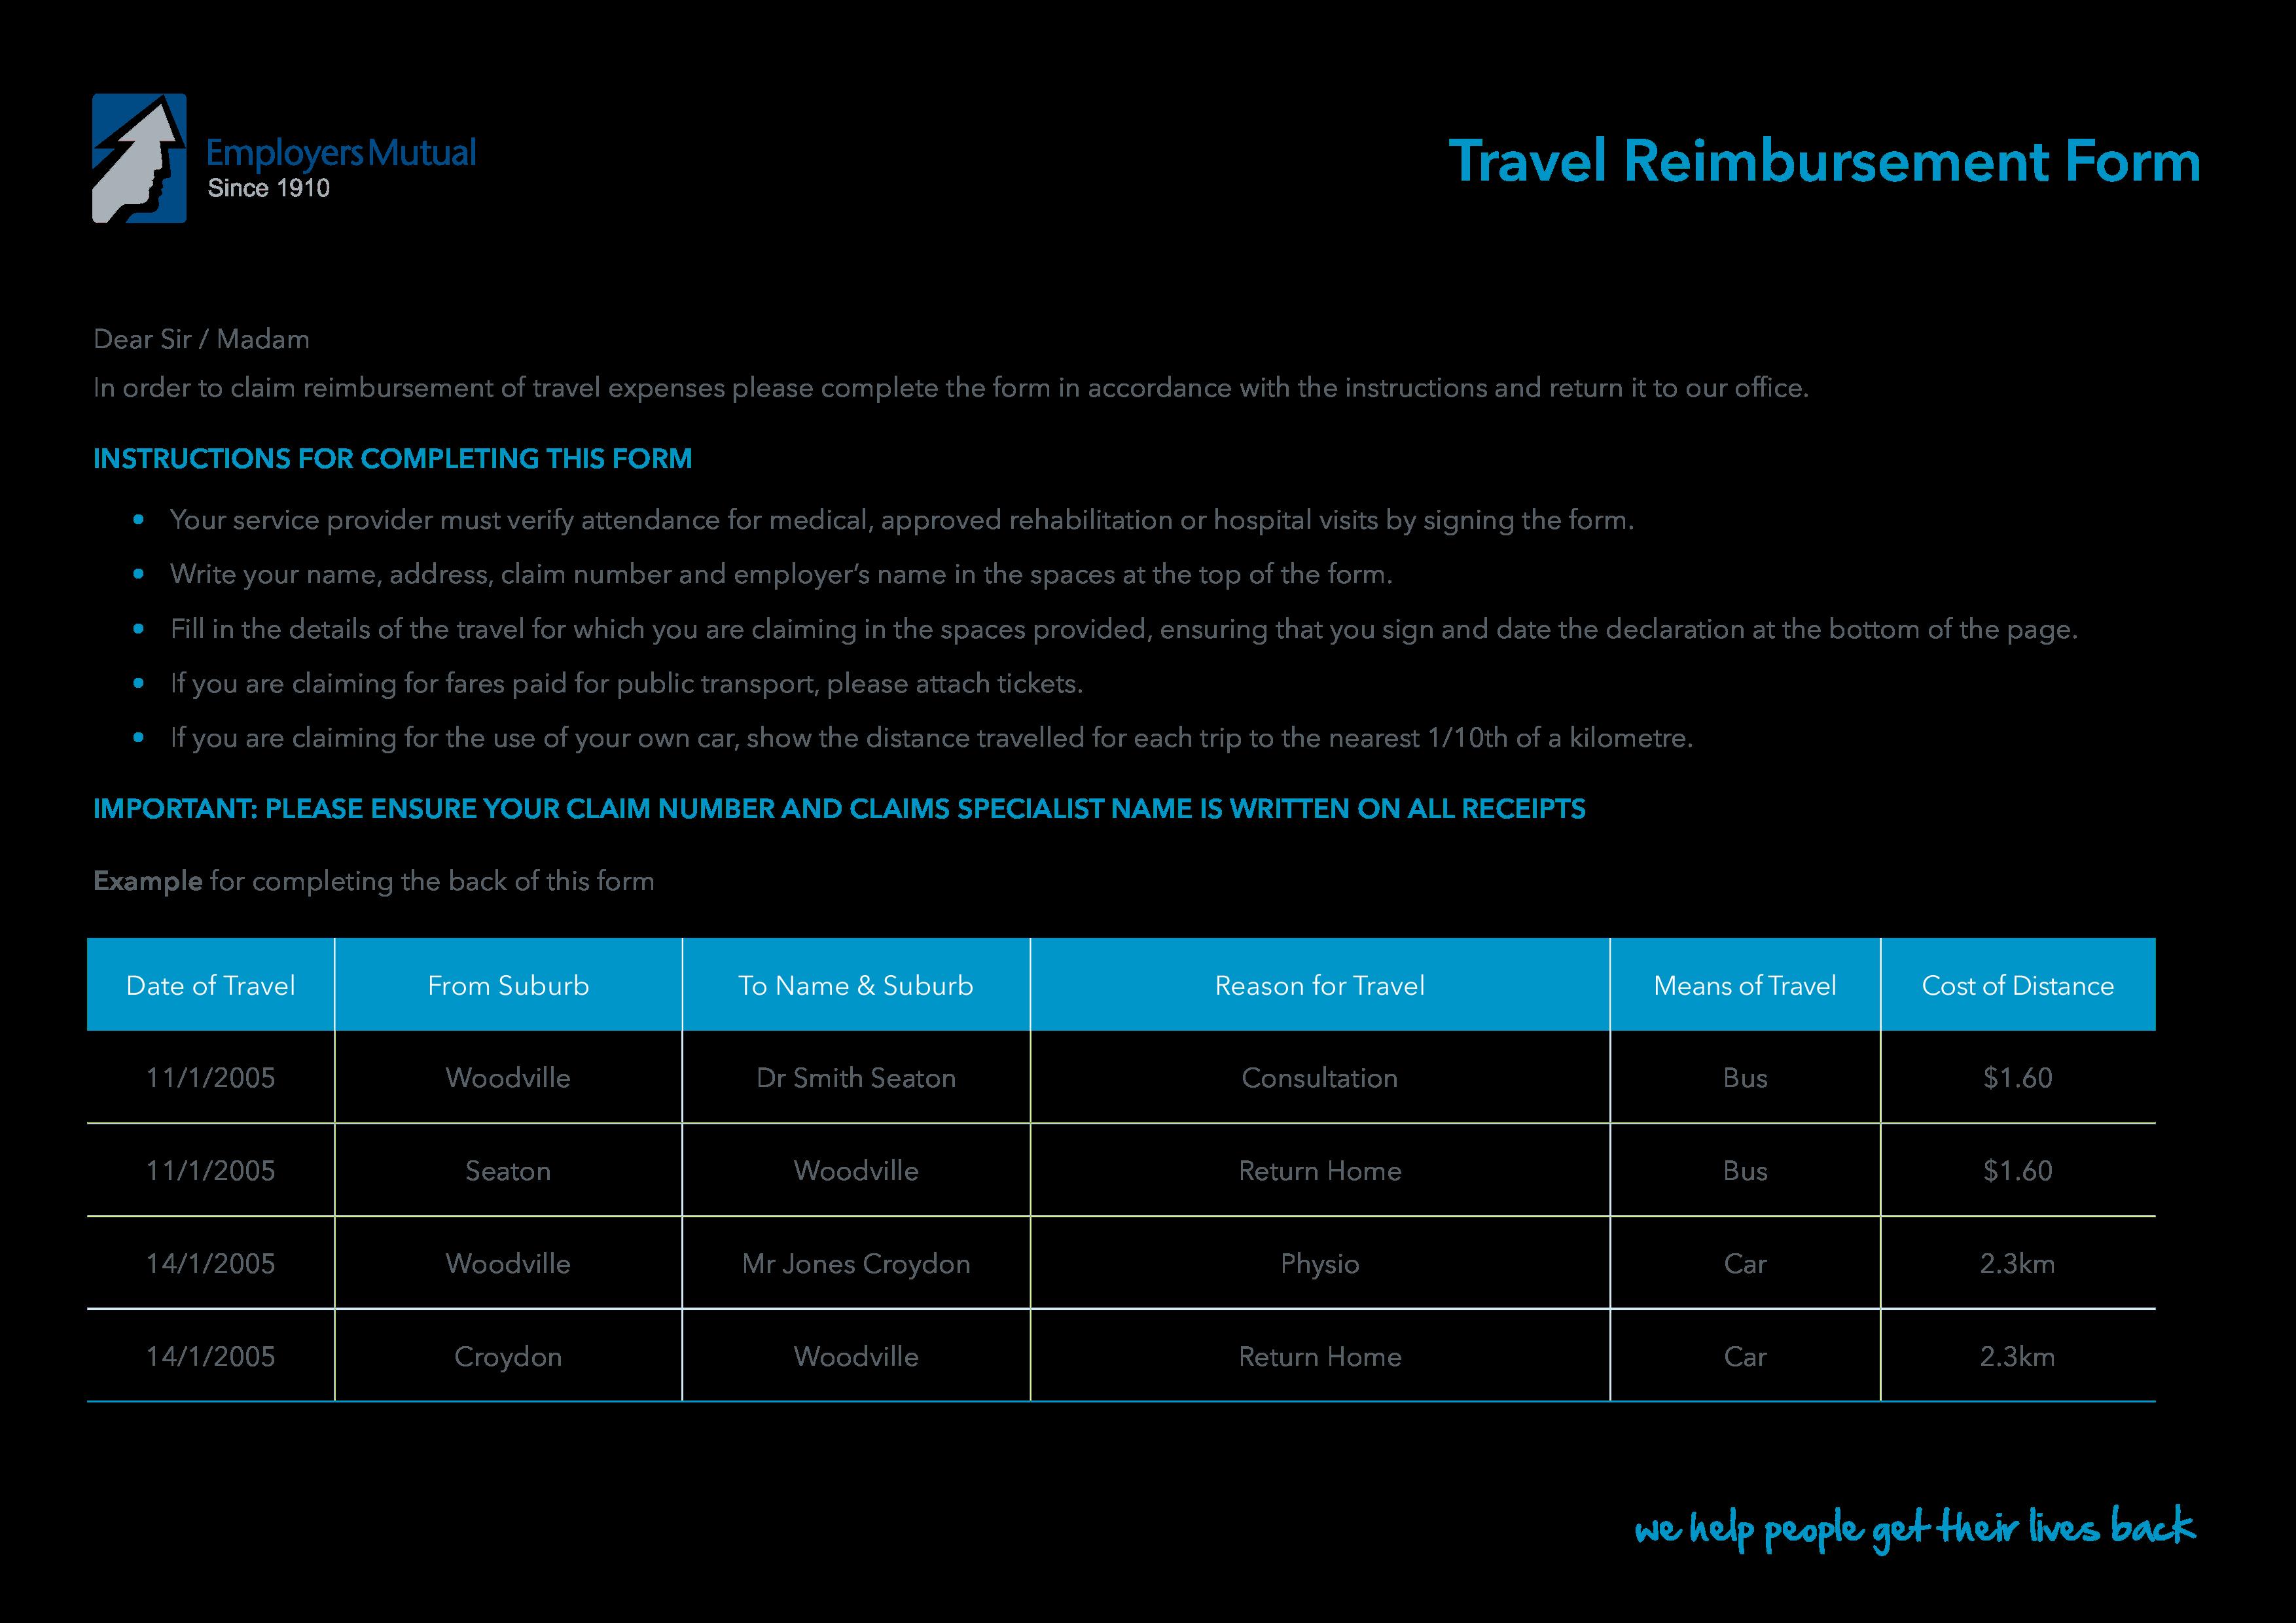 Travel Reimbursement Form For Expenses Main Image